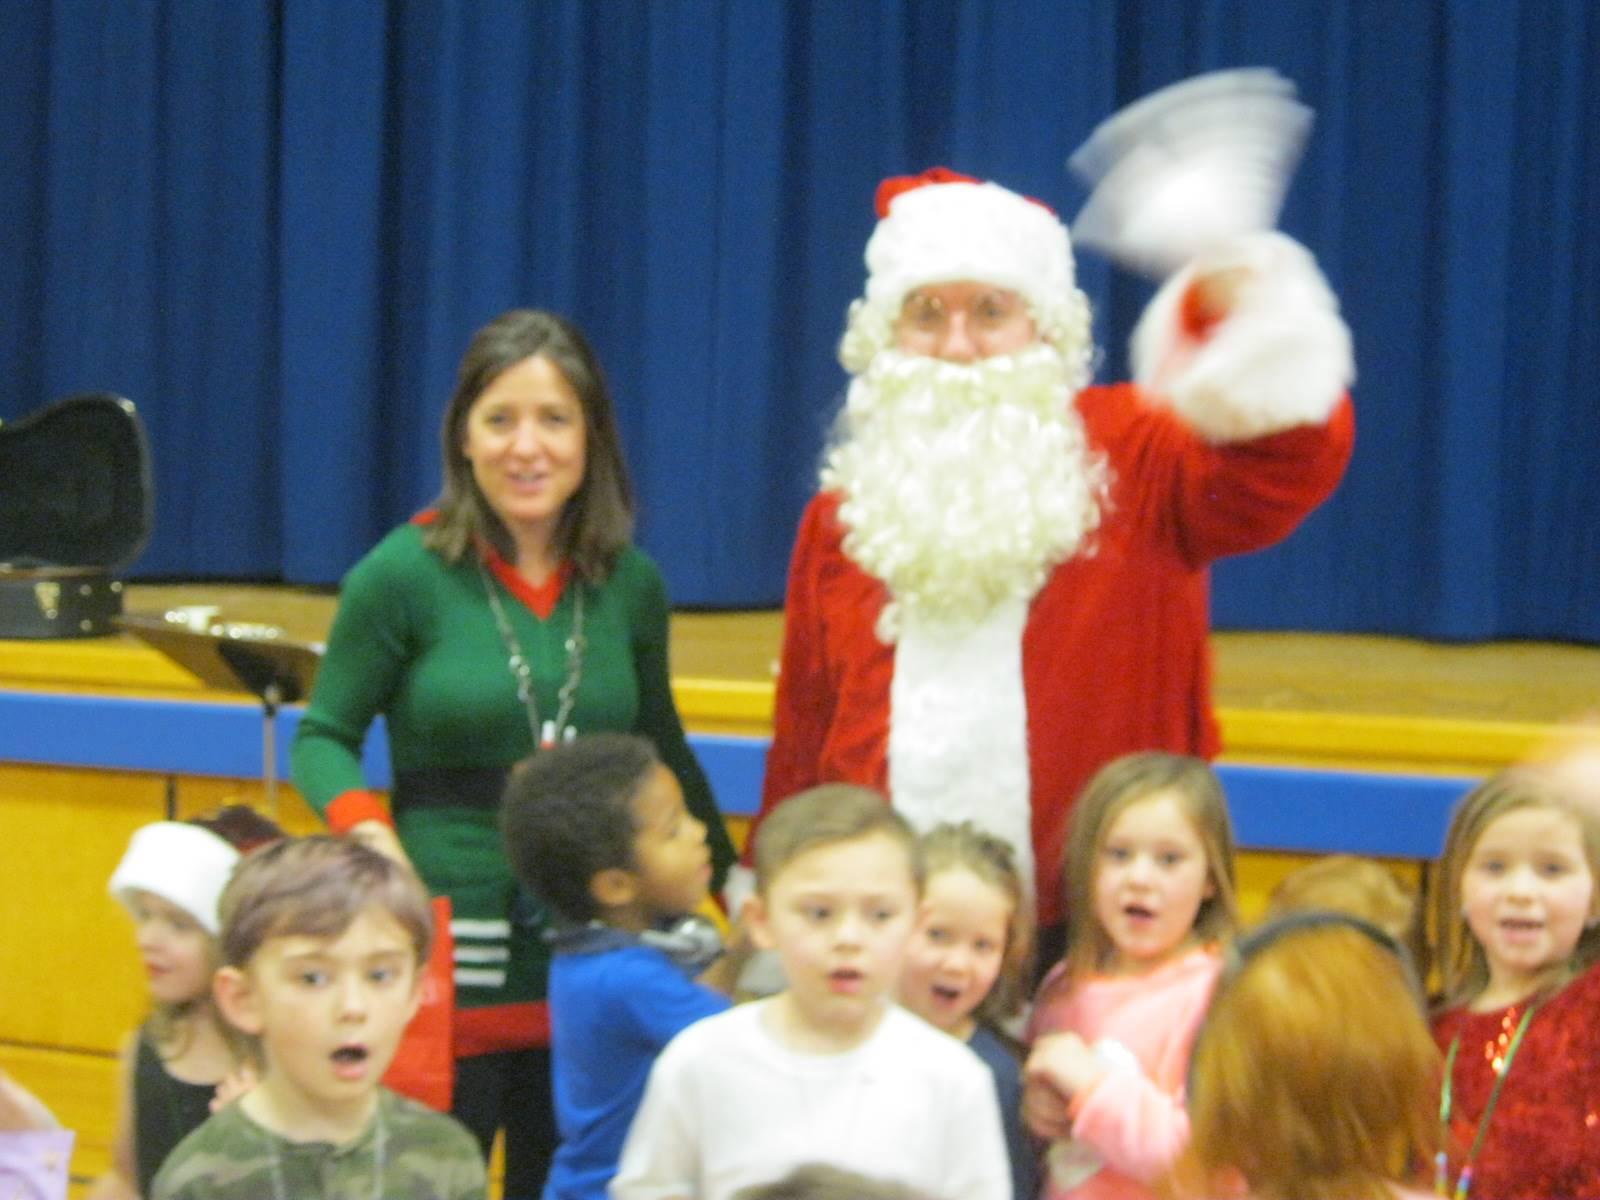 Santa and teacher with kids.